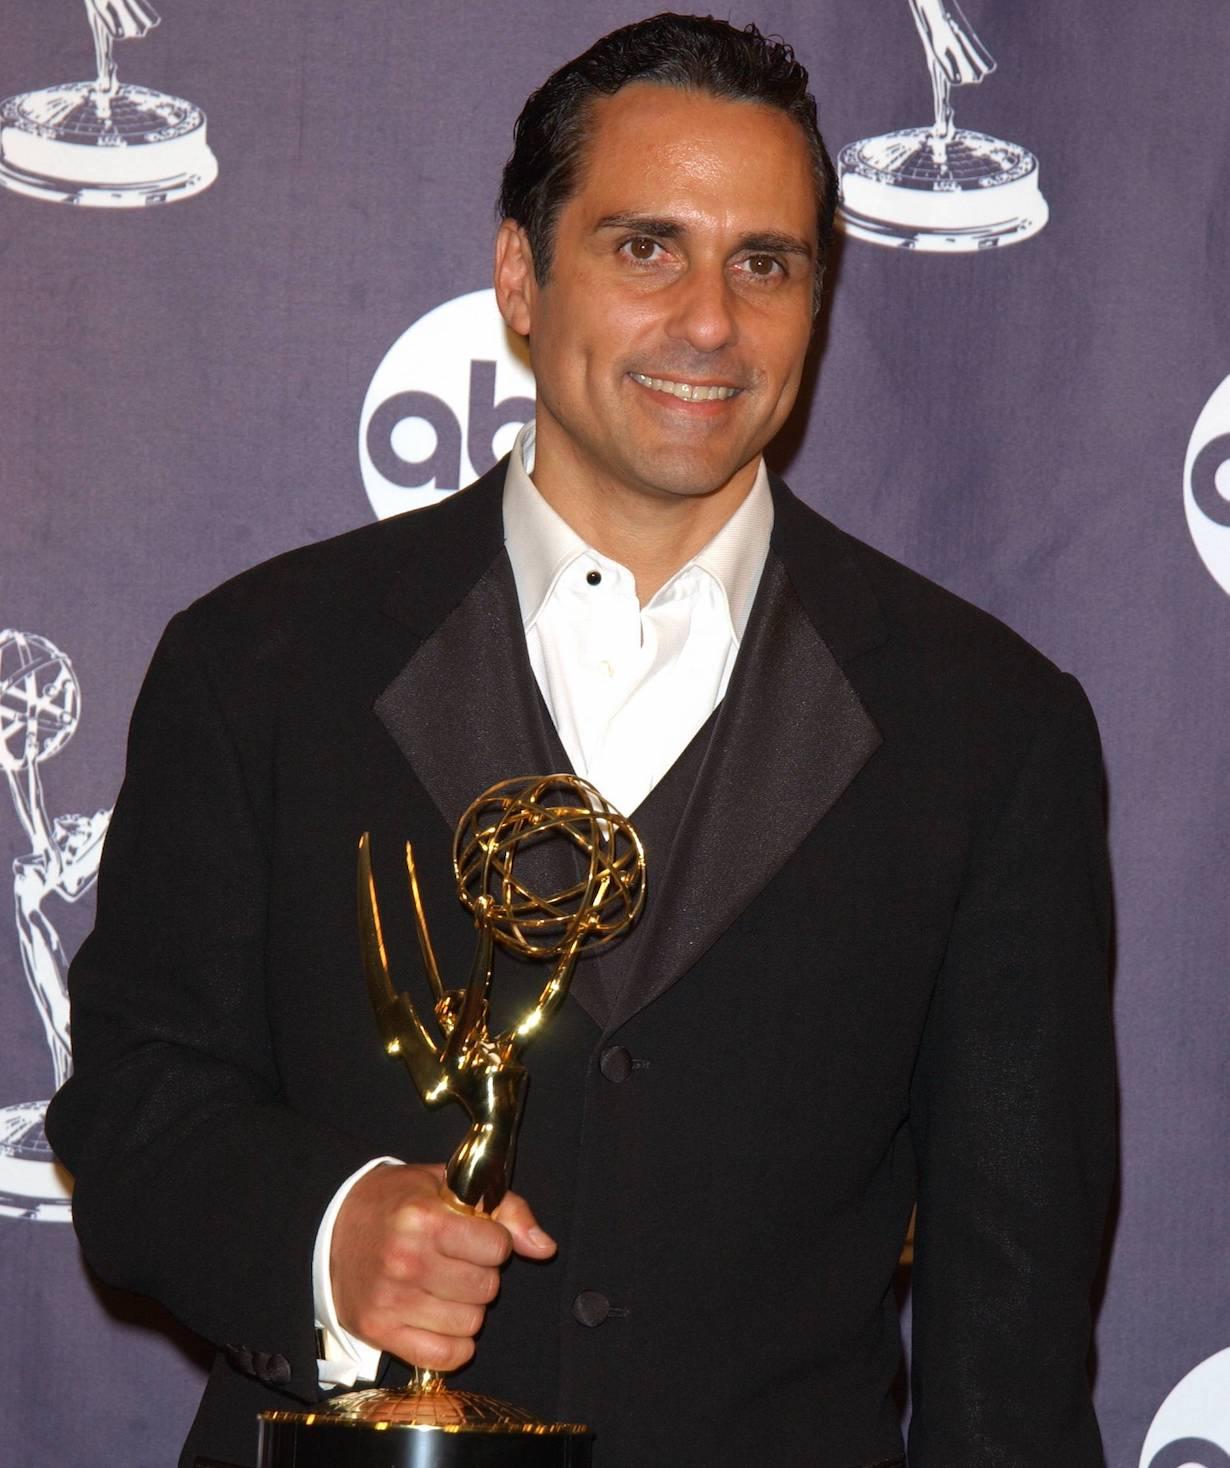 Maurice Benard 30th Daytime Emmy Awards Pressroom Radio City Music Hall New York City 5/16/03 ©Lisa Rose/JPI 310-657-9661